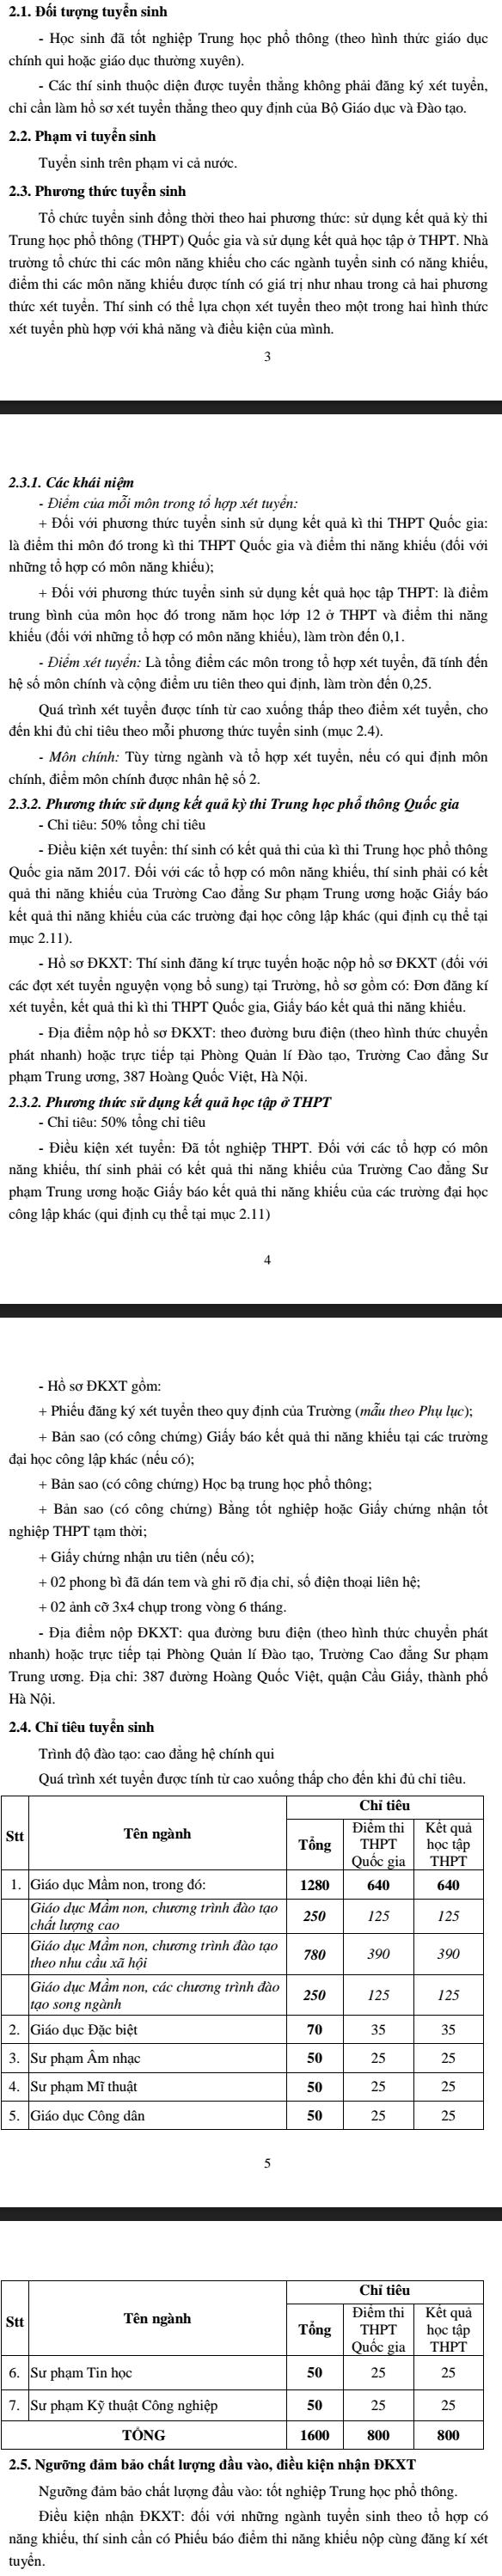 Cao dang su pham trung uong tuyen sinh nam 2017